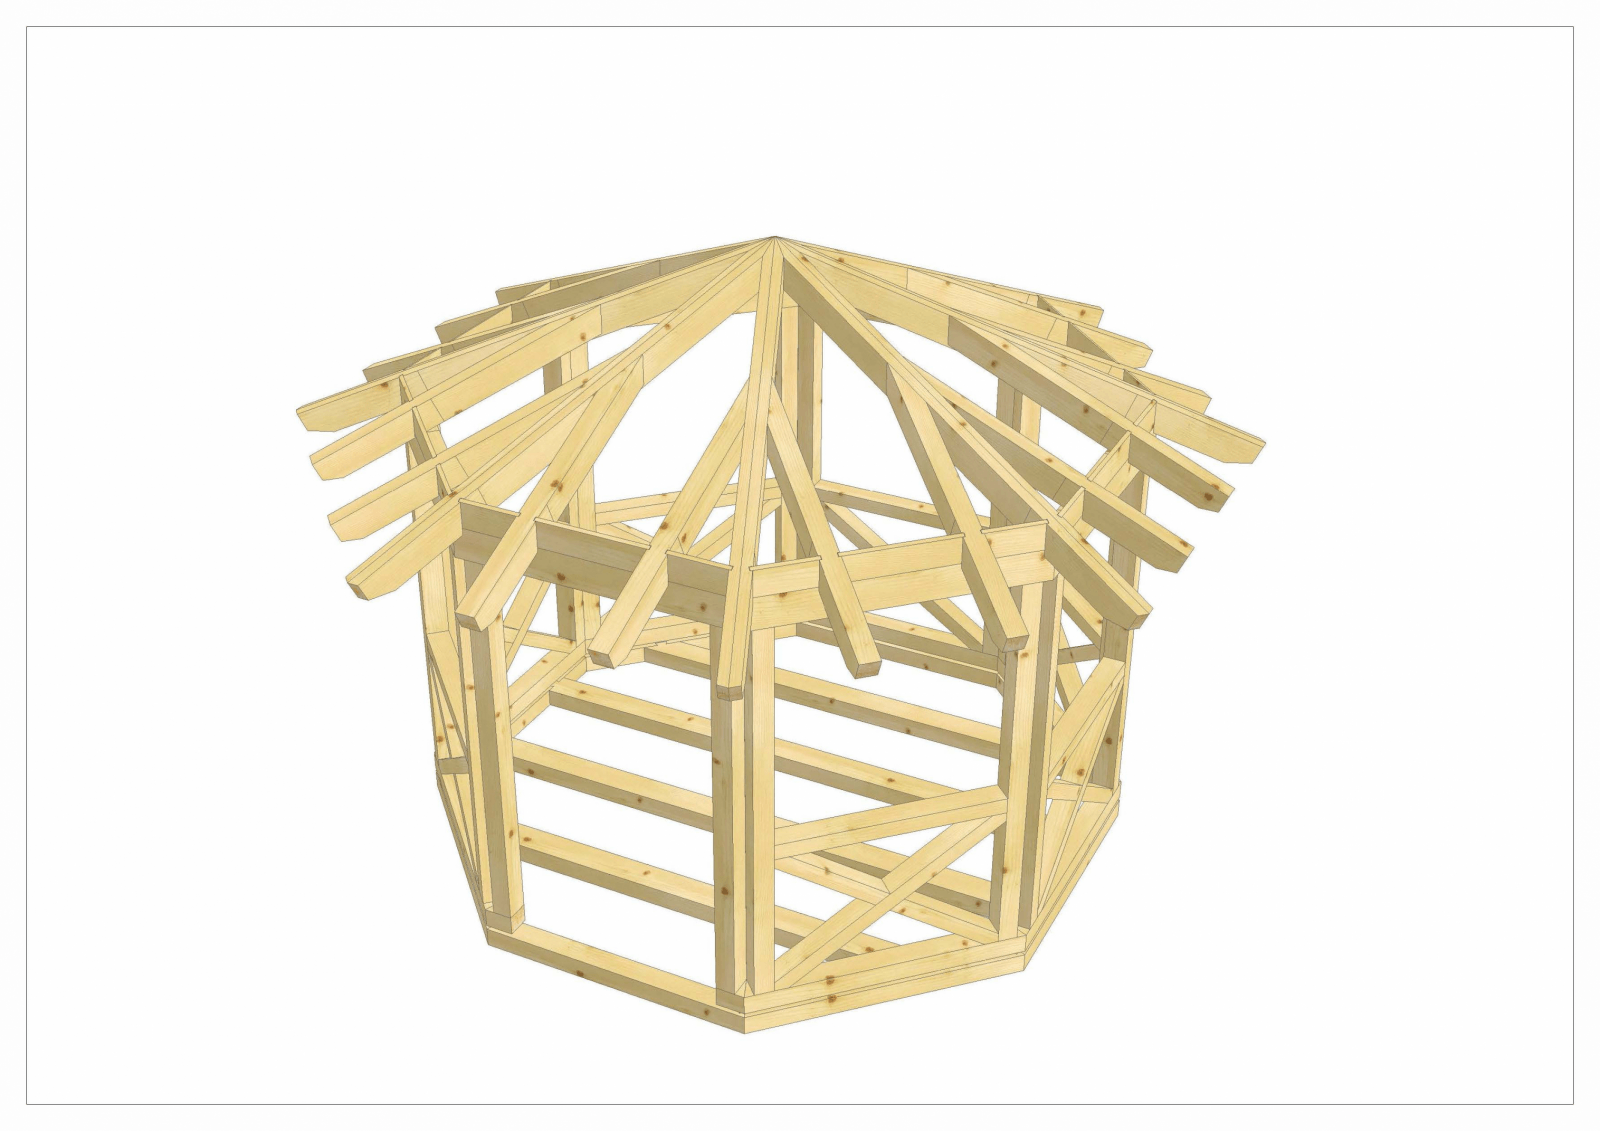 Pavillon 8 Eckig Holz Pt36 – Hitoiro von Pavillon 8 Eckig Holz Bauanleitung Photo